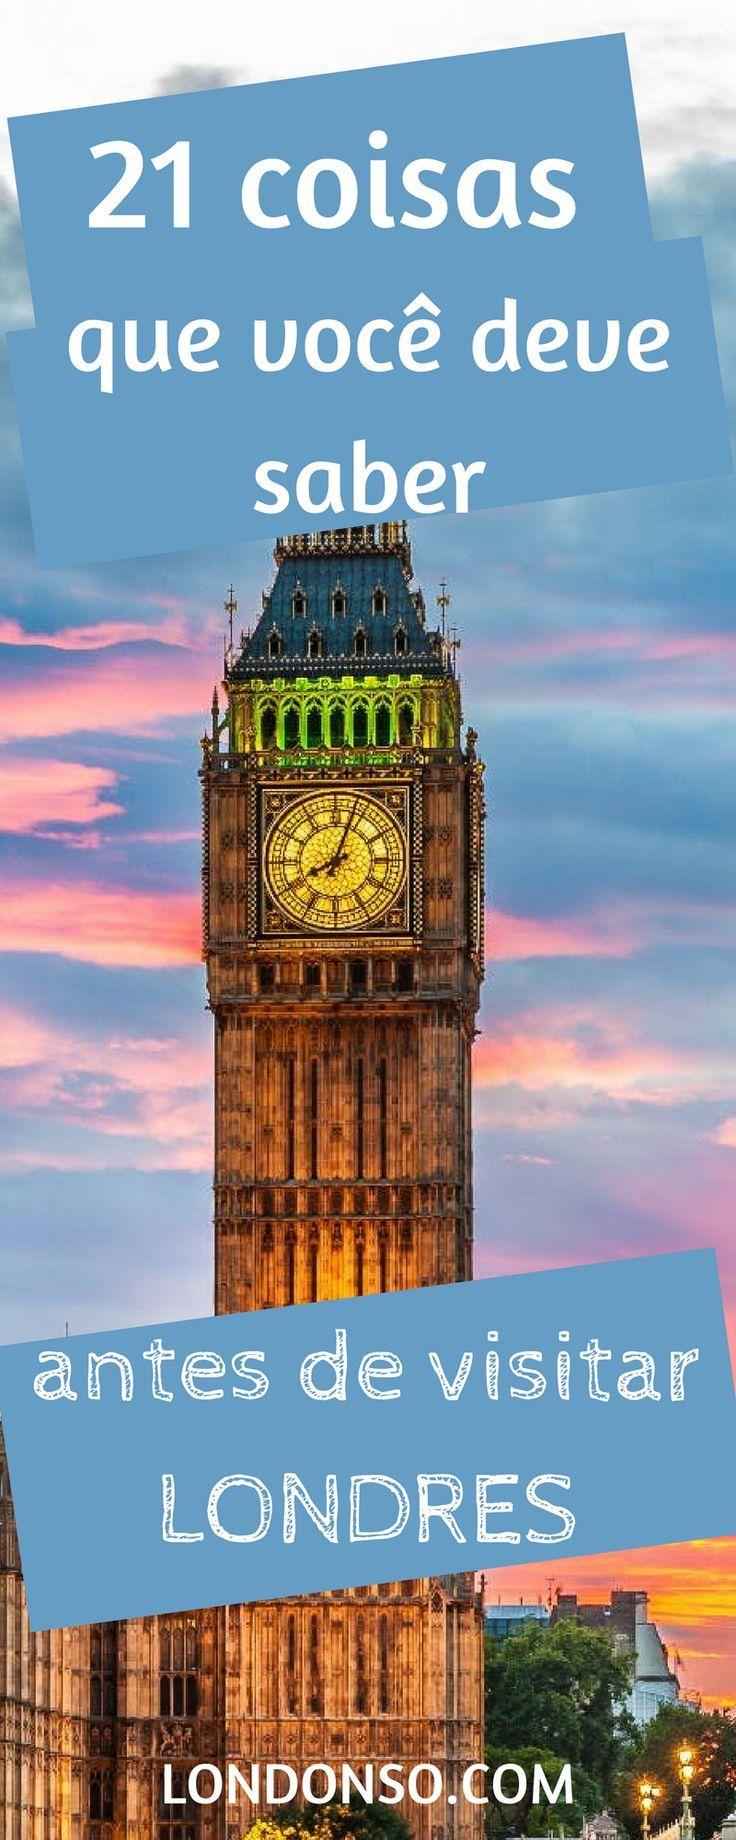 22 coisas que você deve saber antes de visitar Londres   – Londres | London